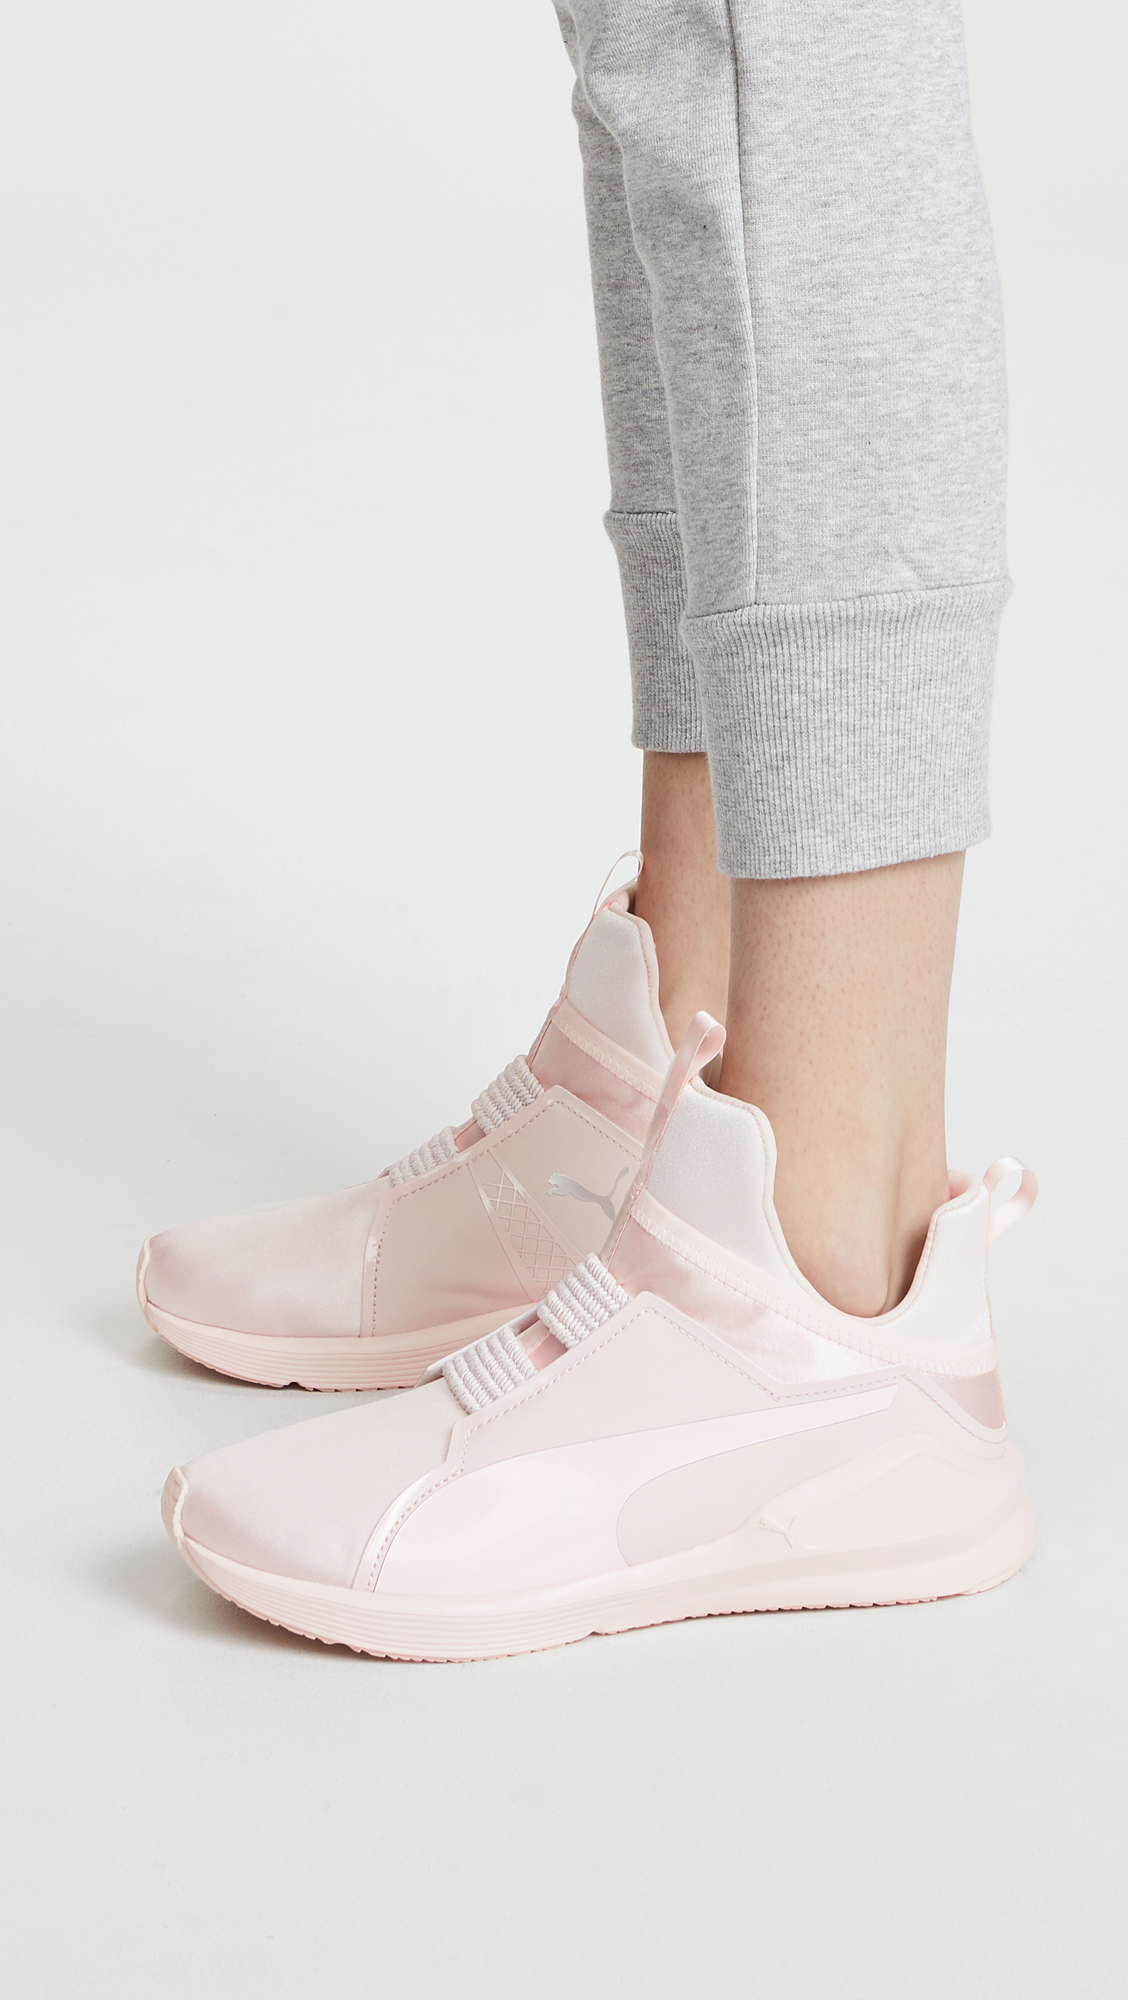 PUMA Fierce Satin EP Sneakers  7a664ed15880